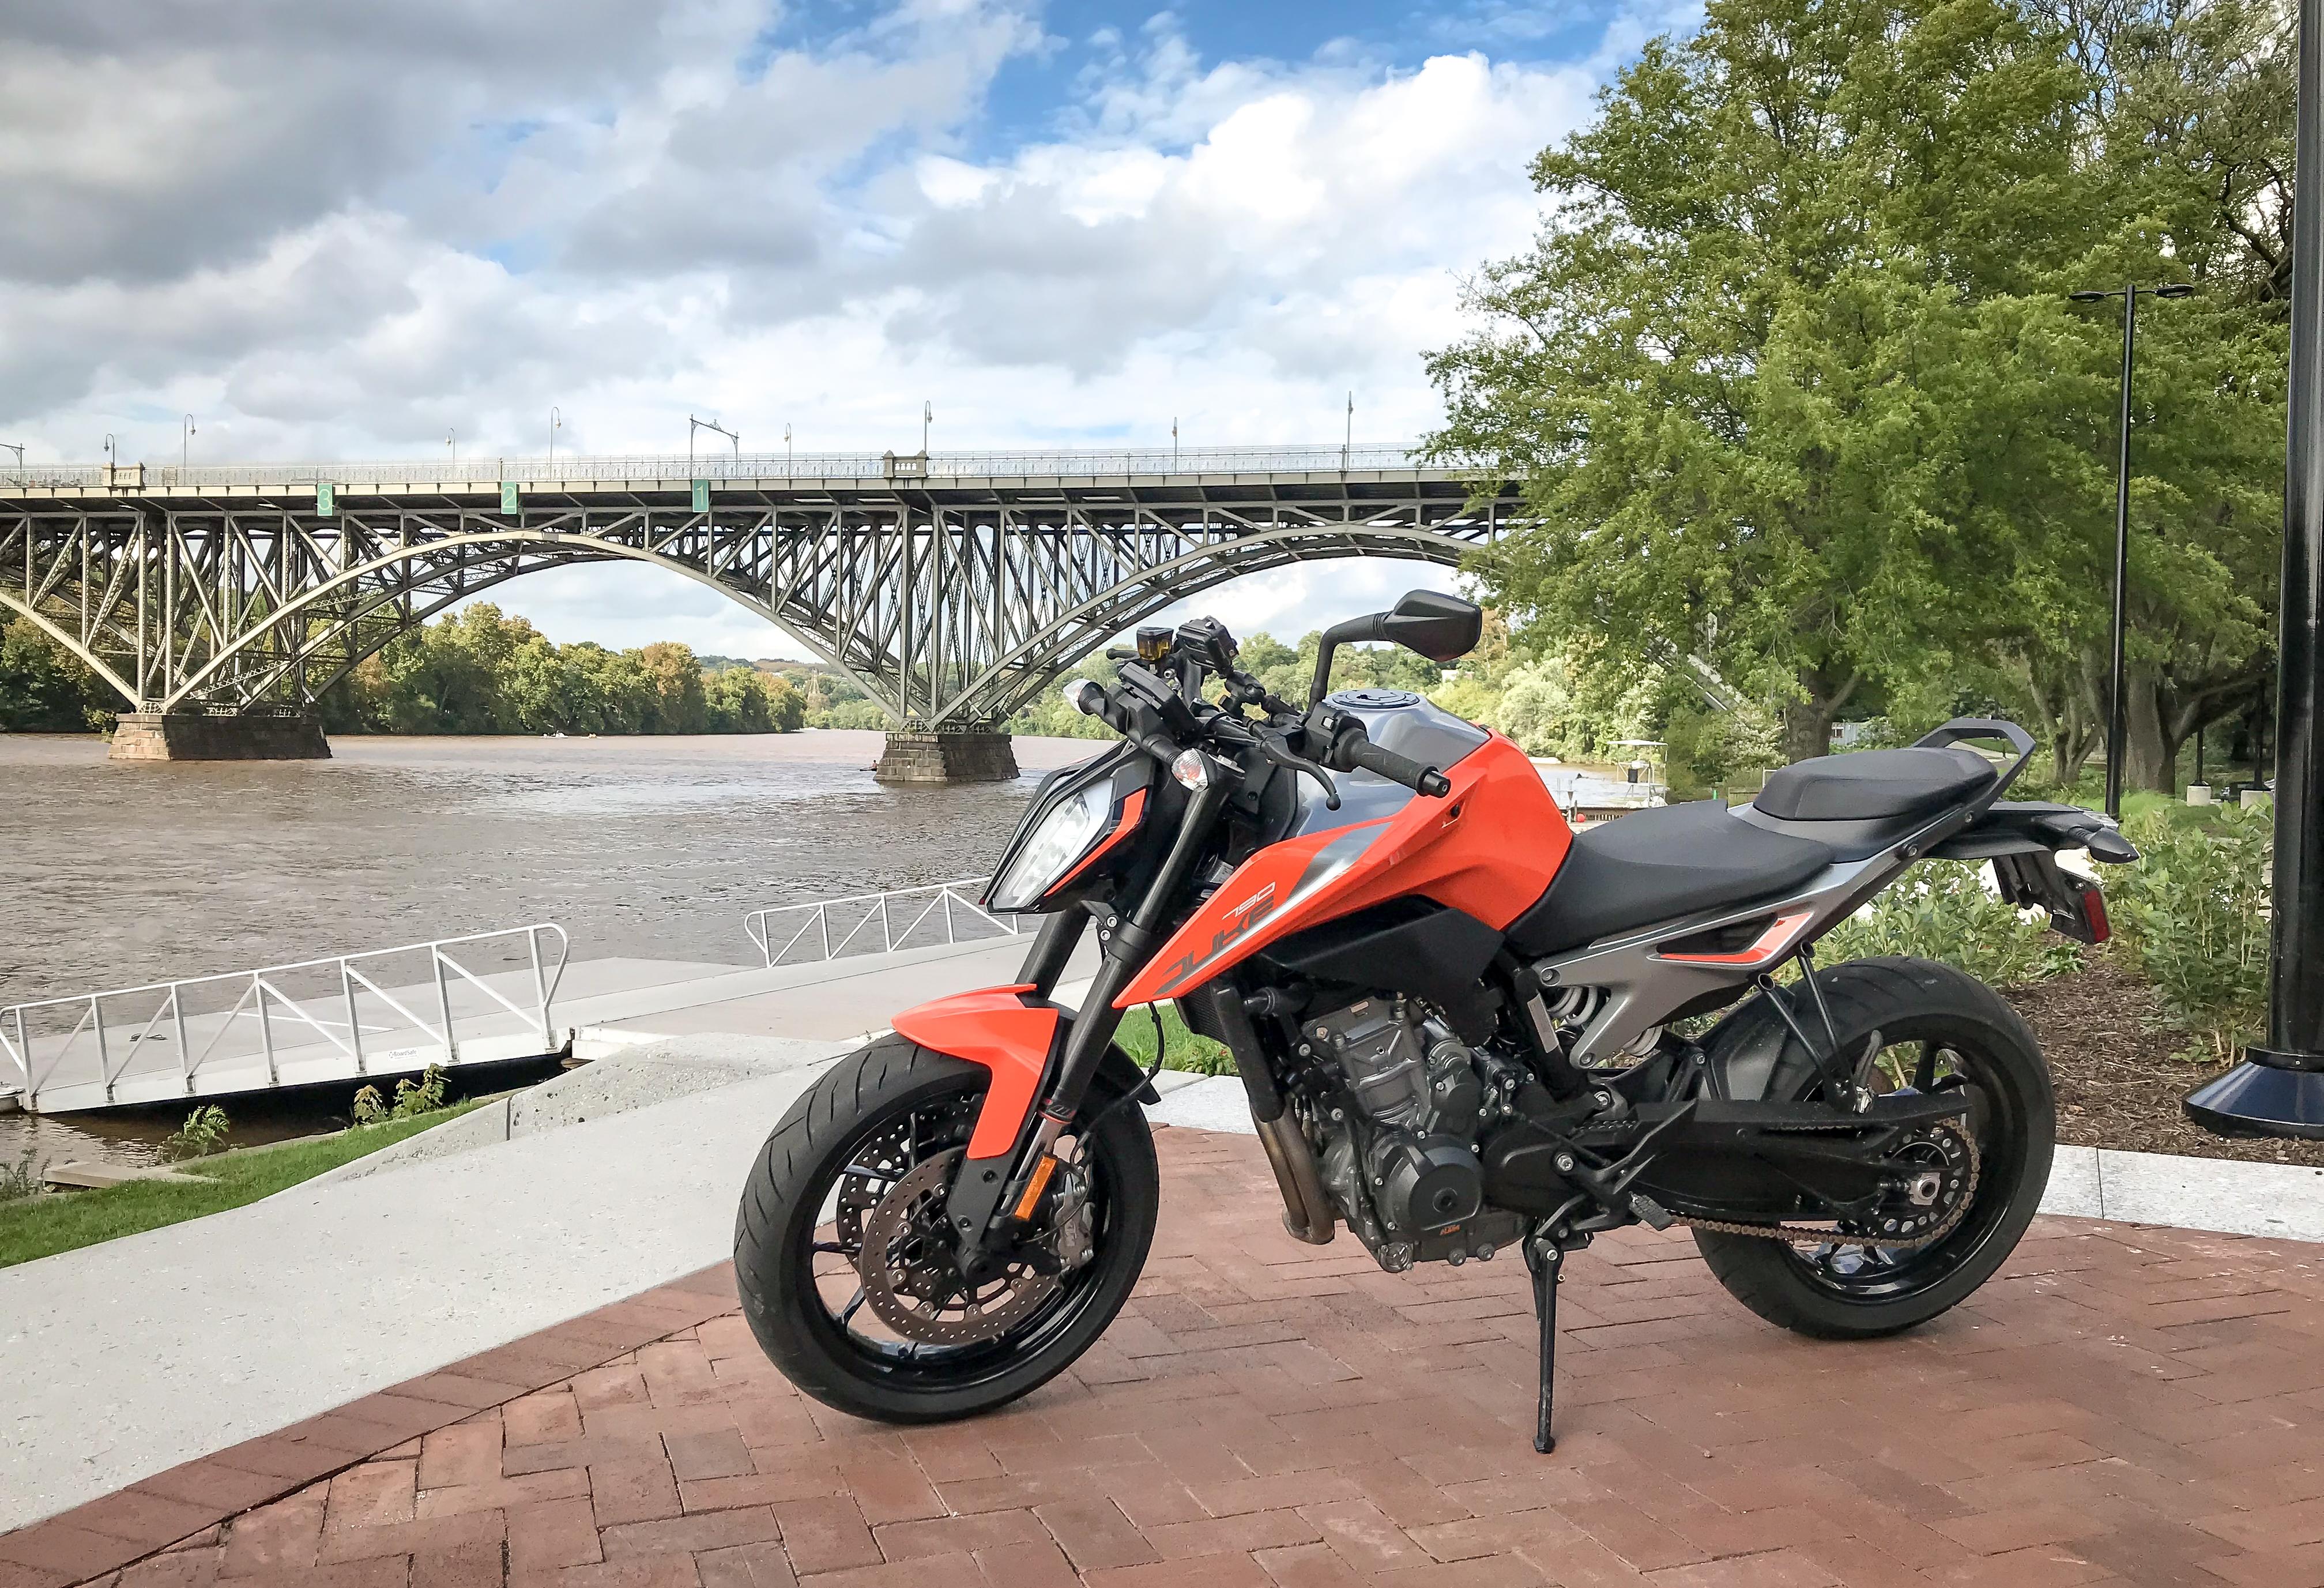 2019 KTM 790 Duke first ride review - RevZilla